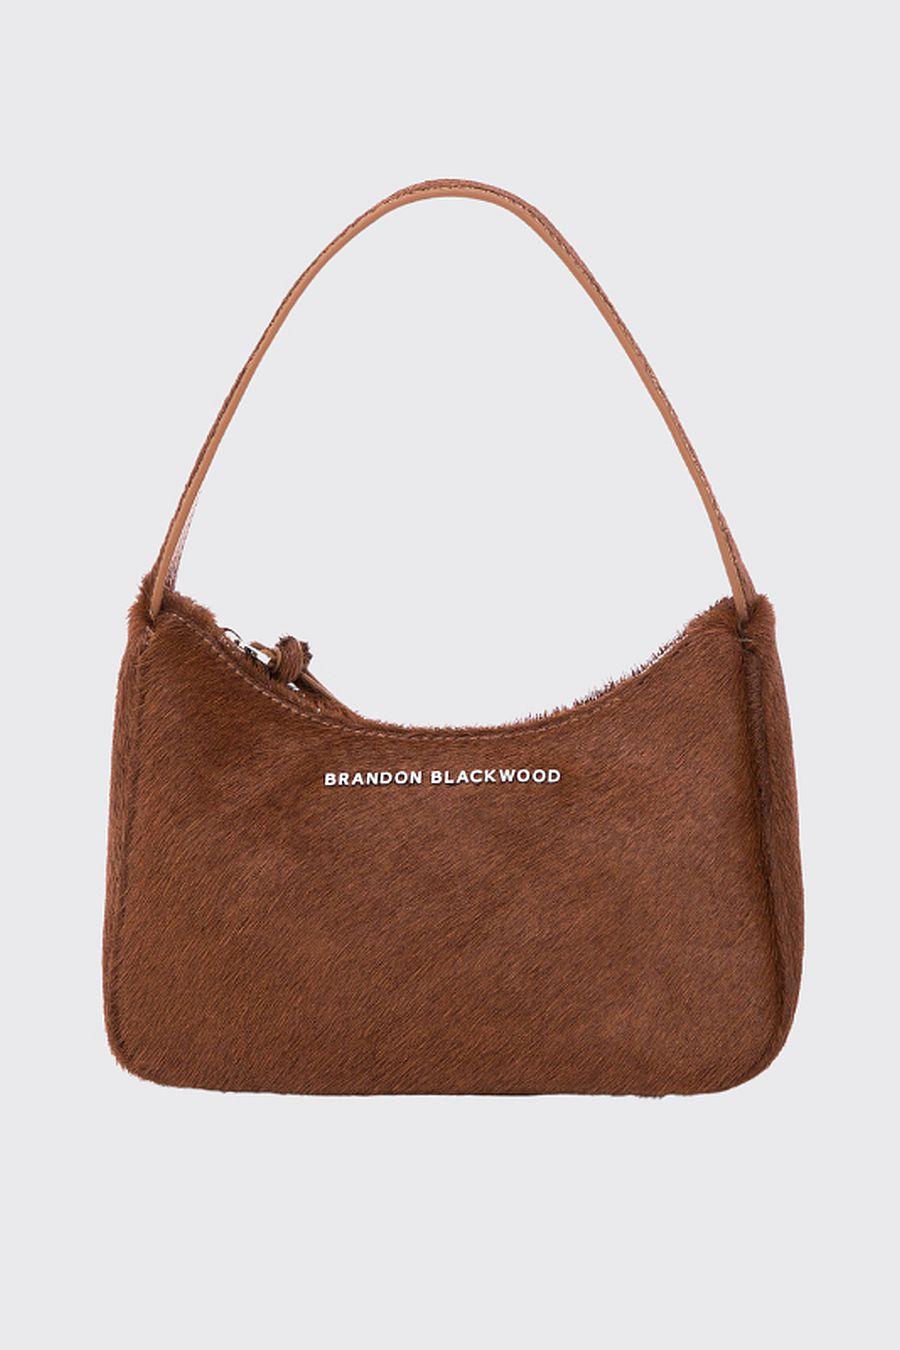 Brandon Blackwood SYL Bag - Brown Ponyhair